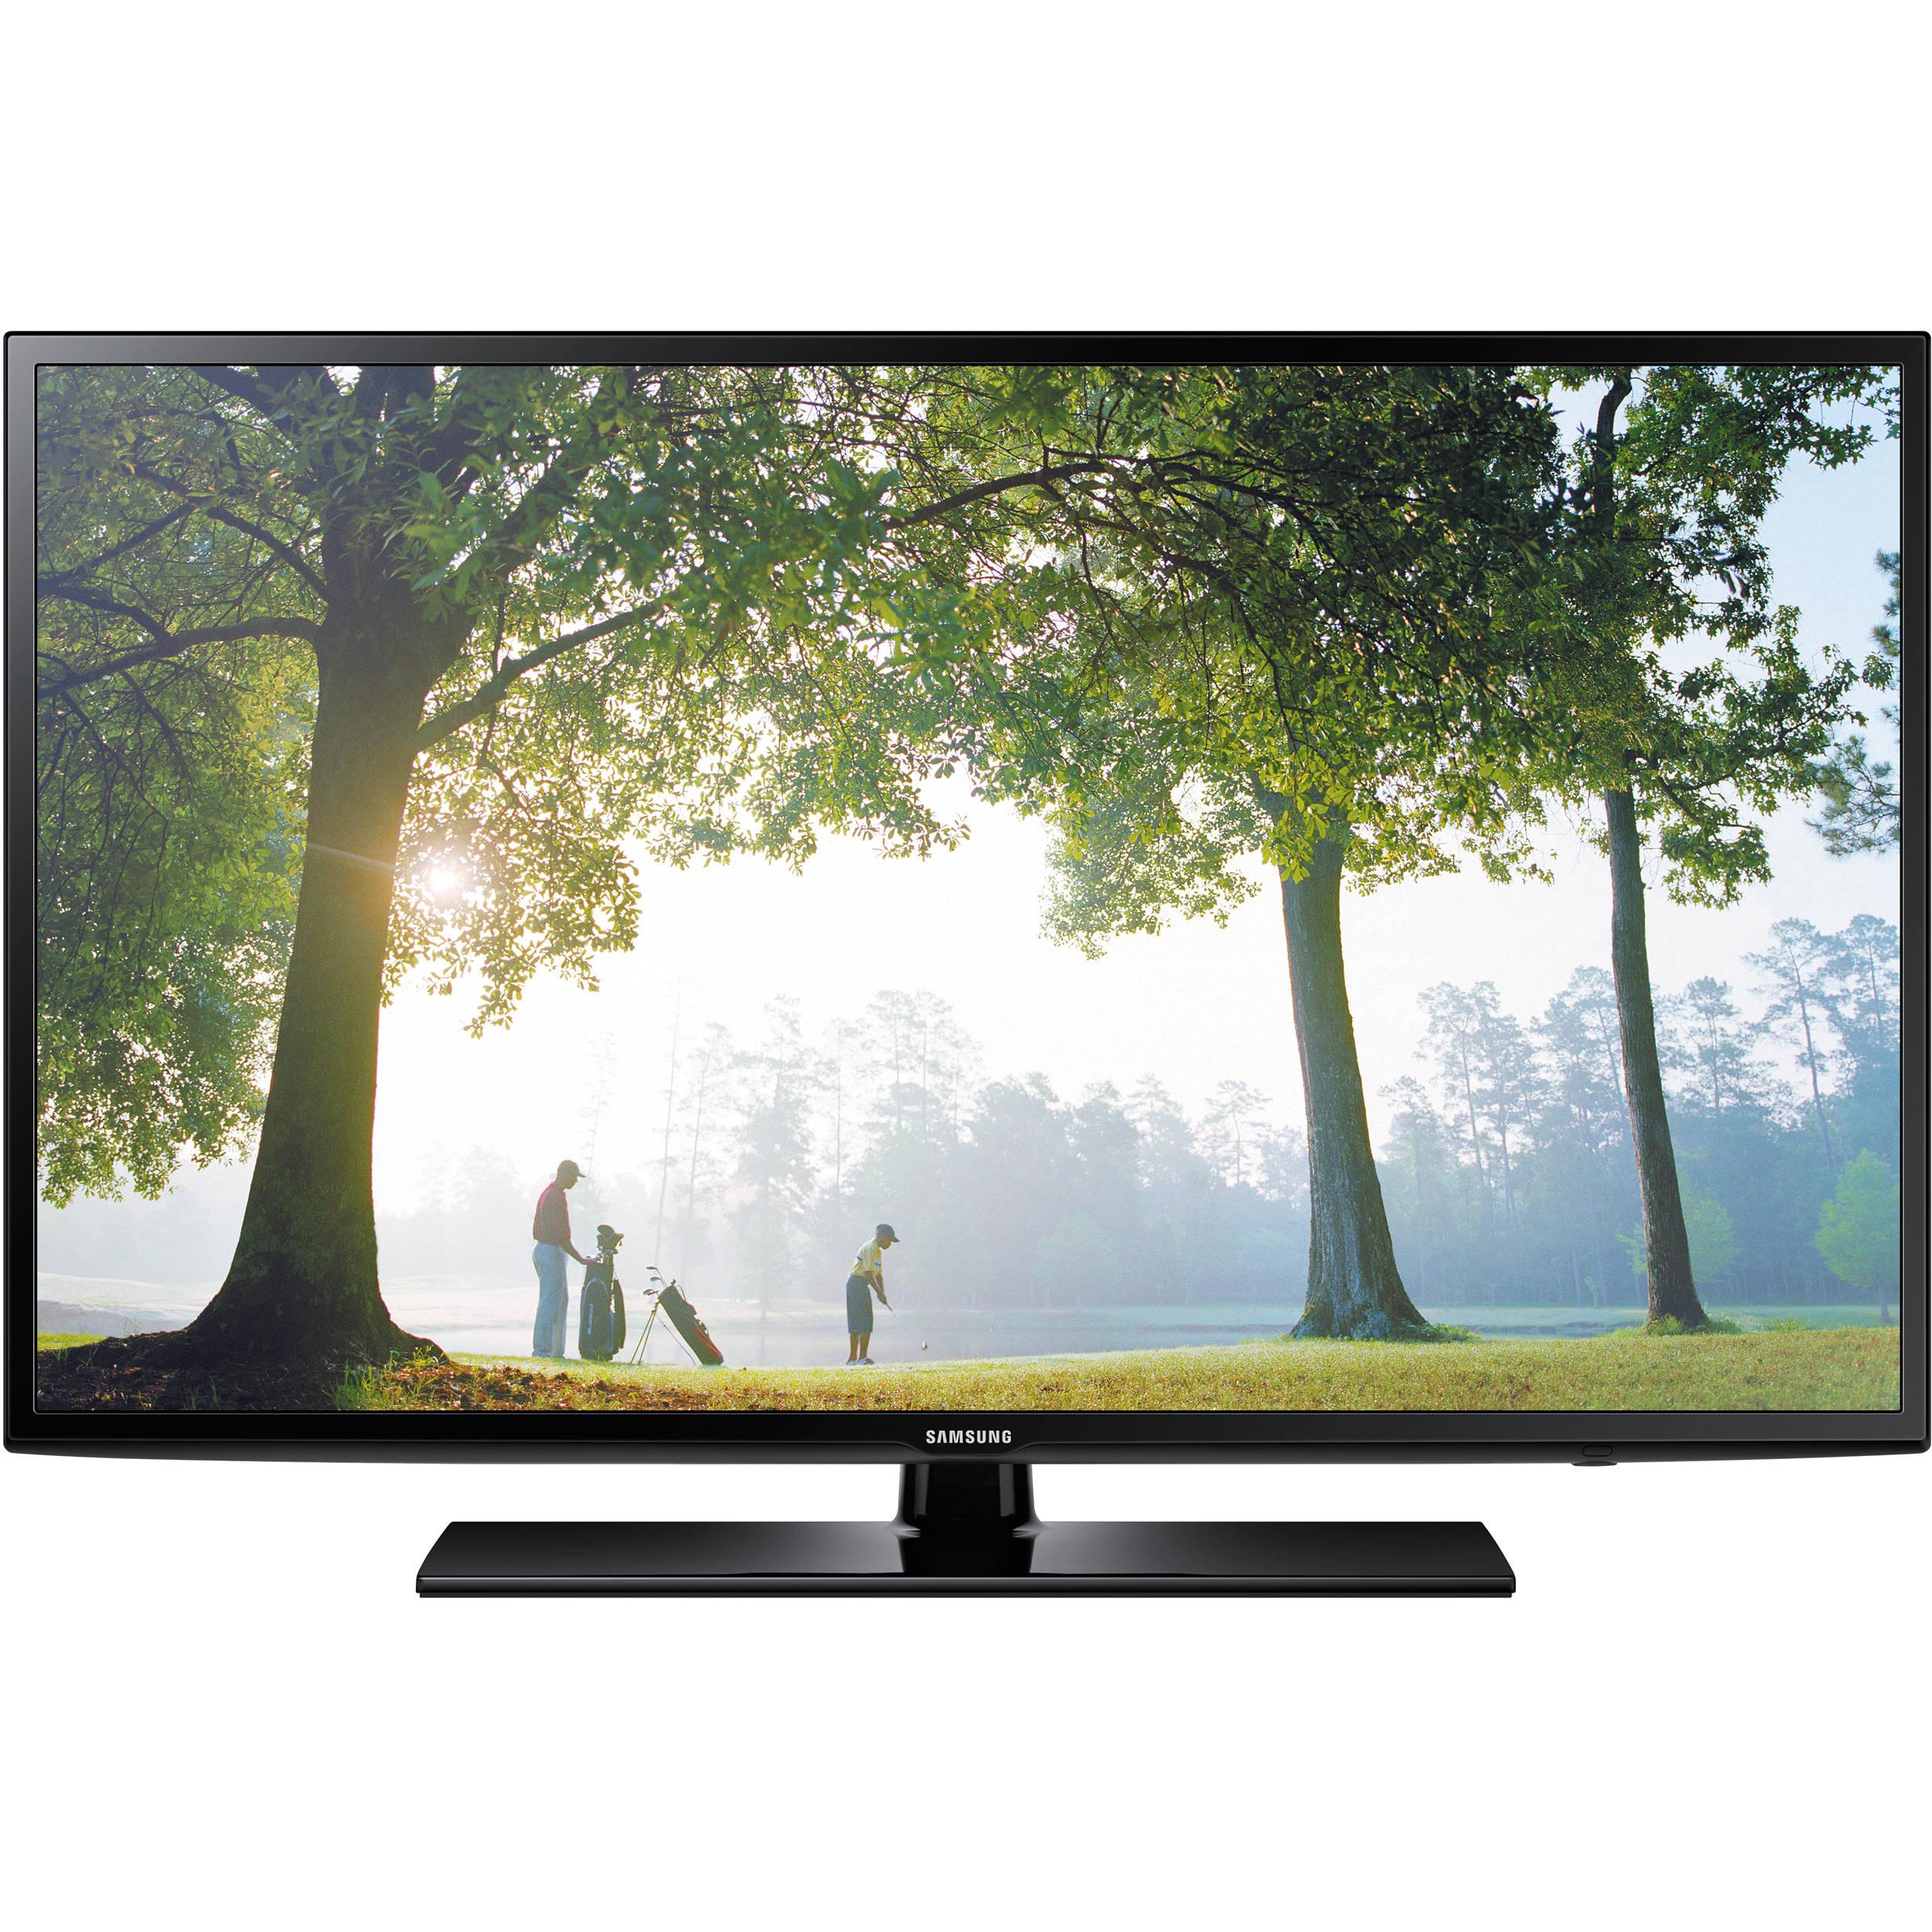 Samsung H6203 Series 46 Class Full Hd Smart Un46h6203afxza Circuit Board For Lcd Tv Led Black